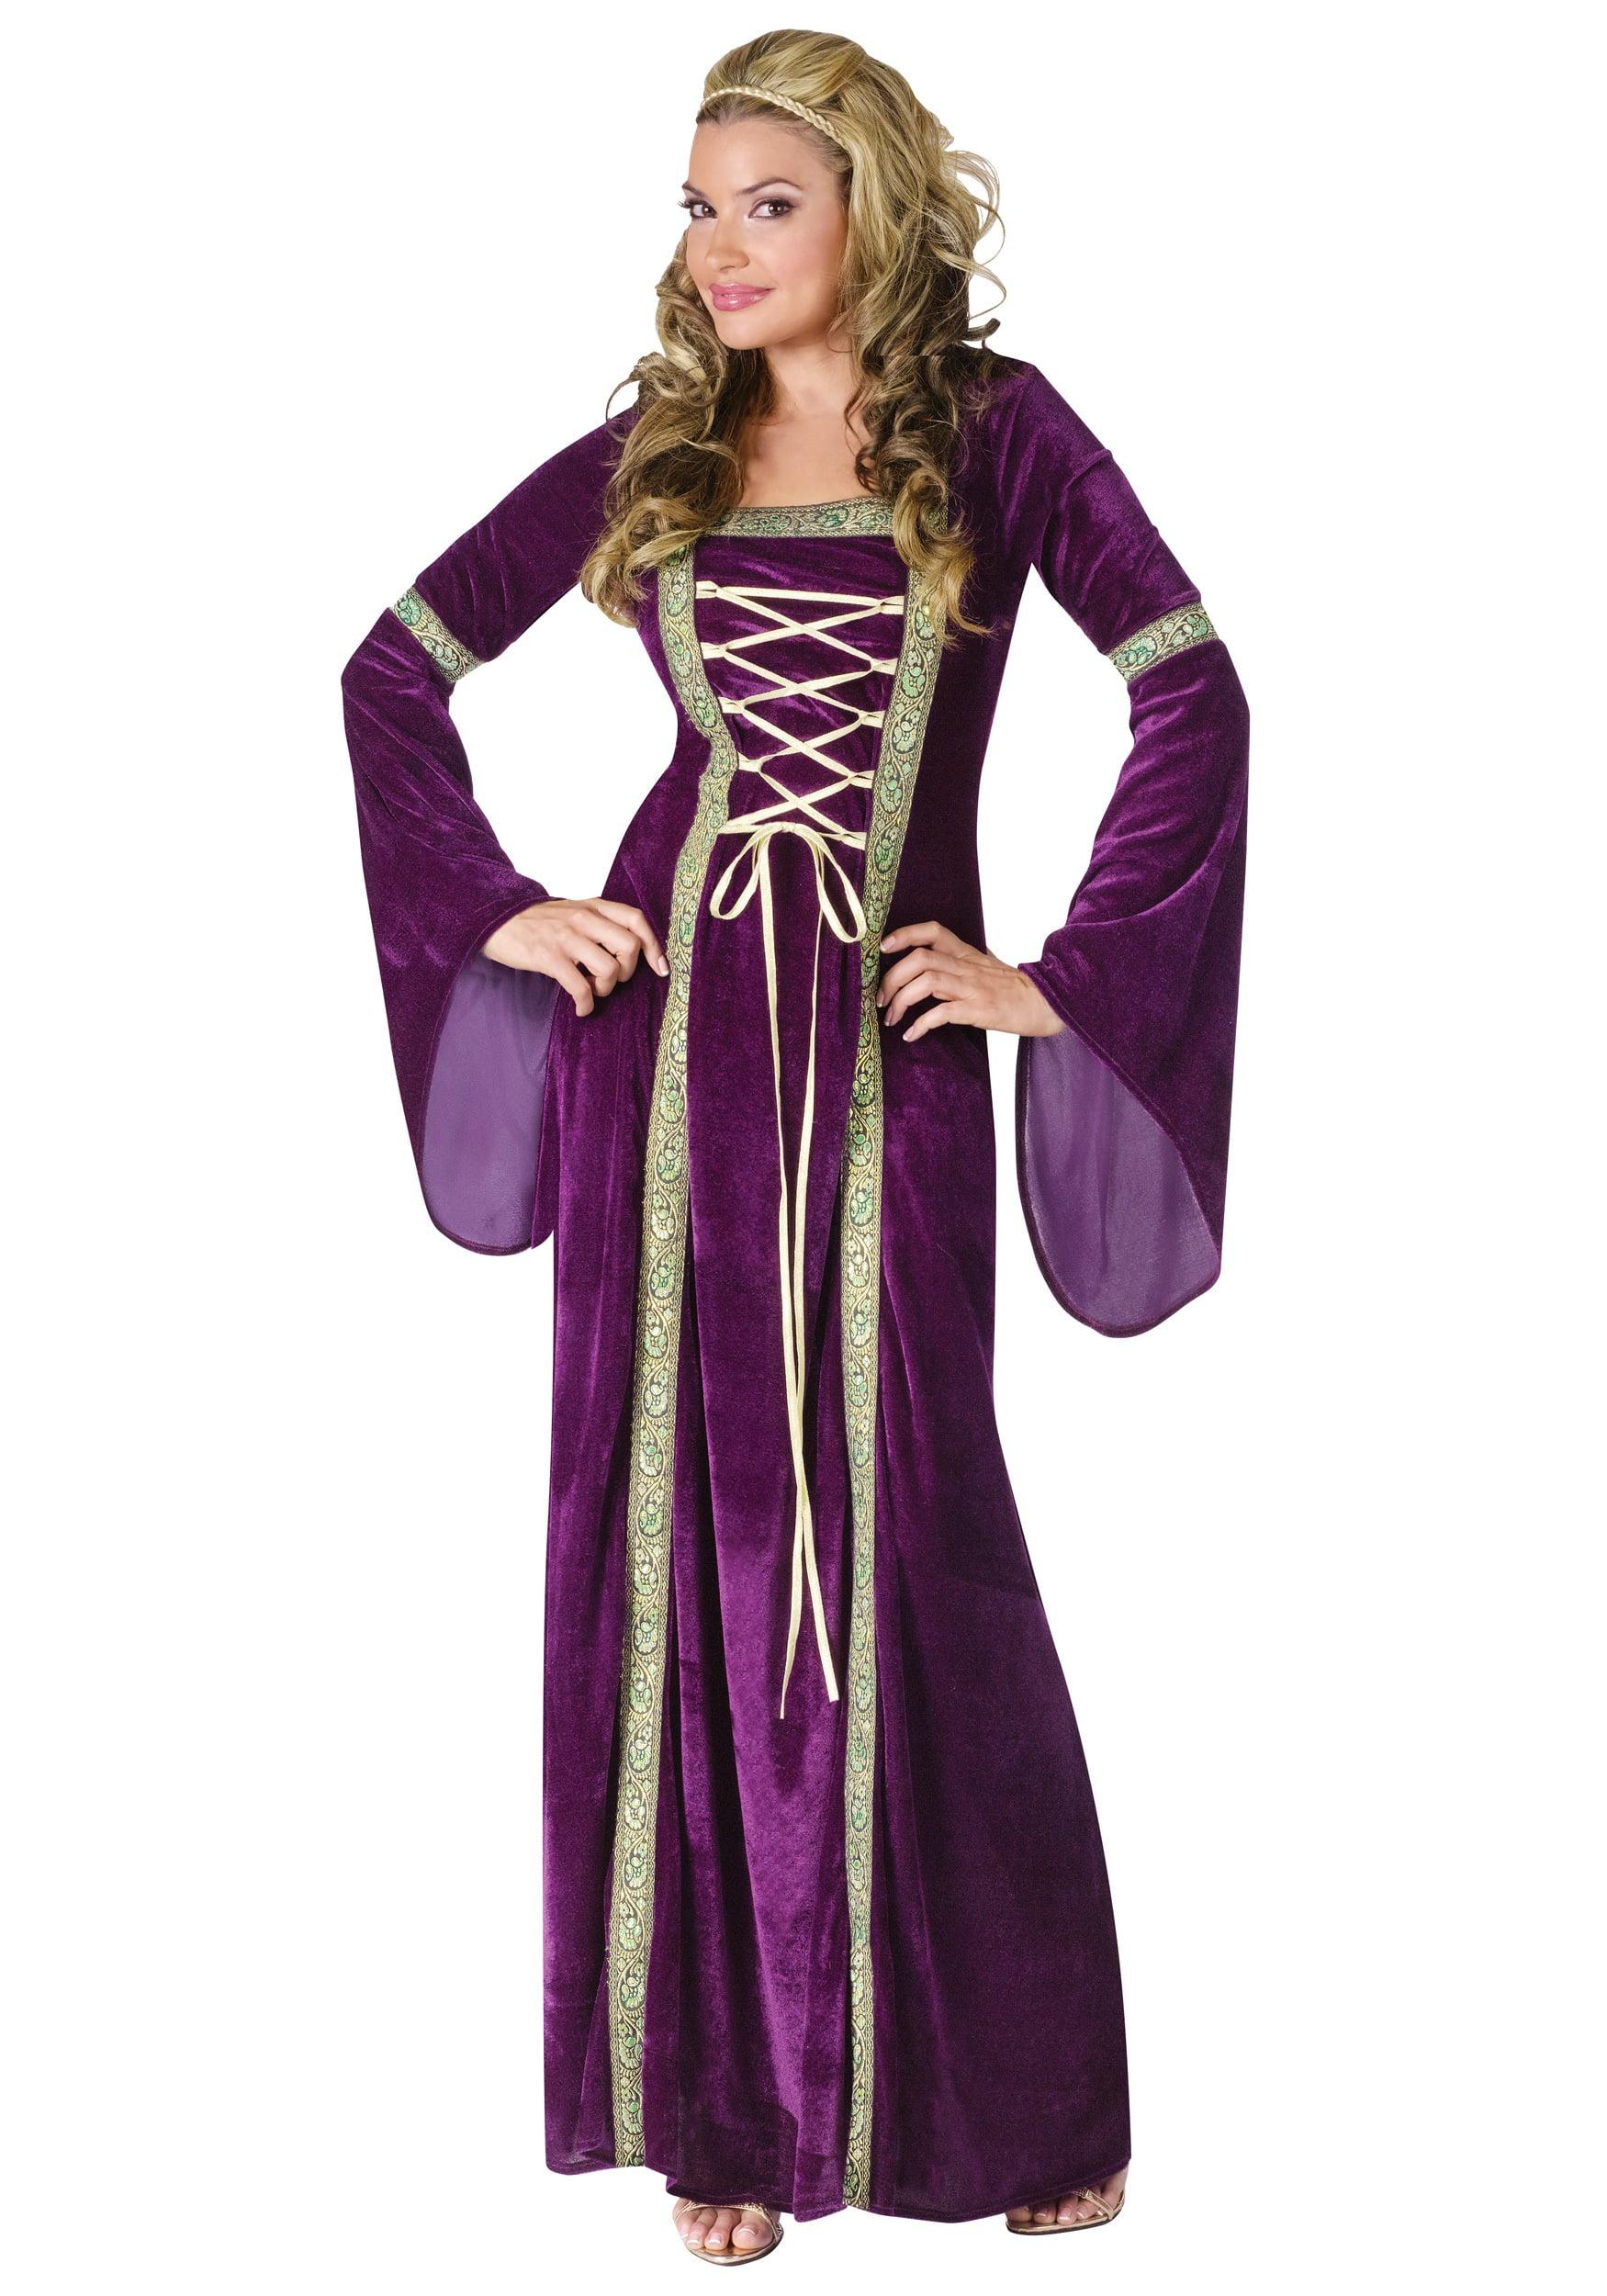 28ae6ff8ec39c Renaissance Lady Adult Halloween Costume - Walmart.com